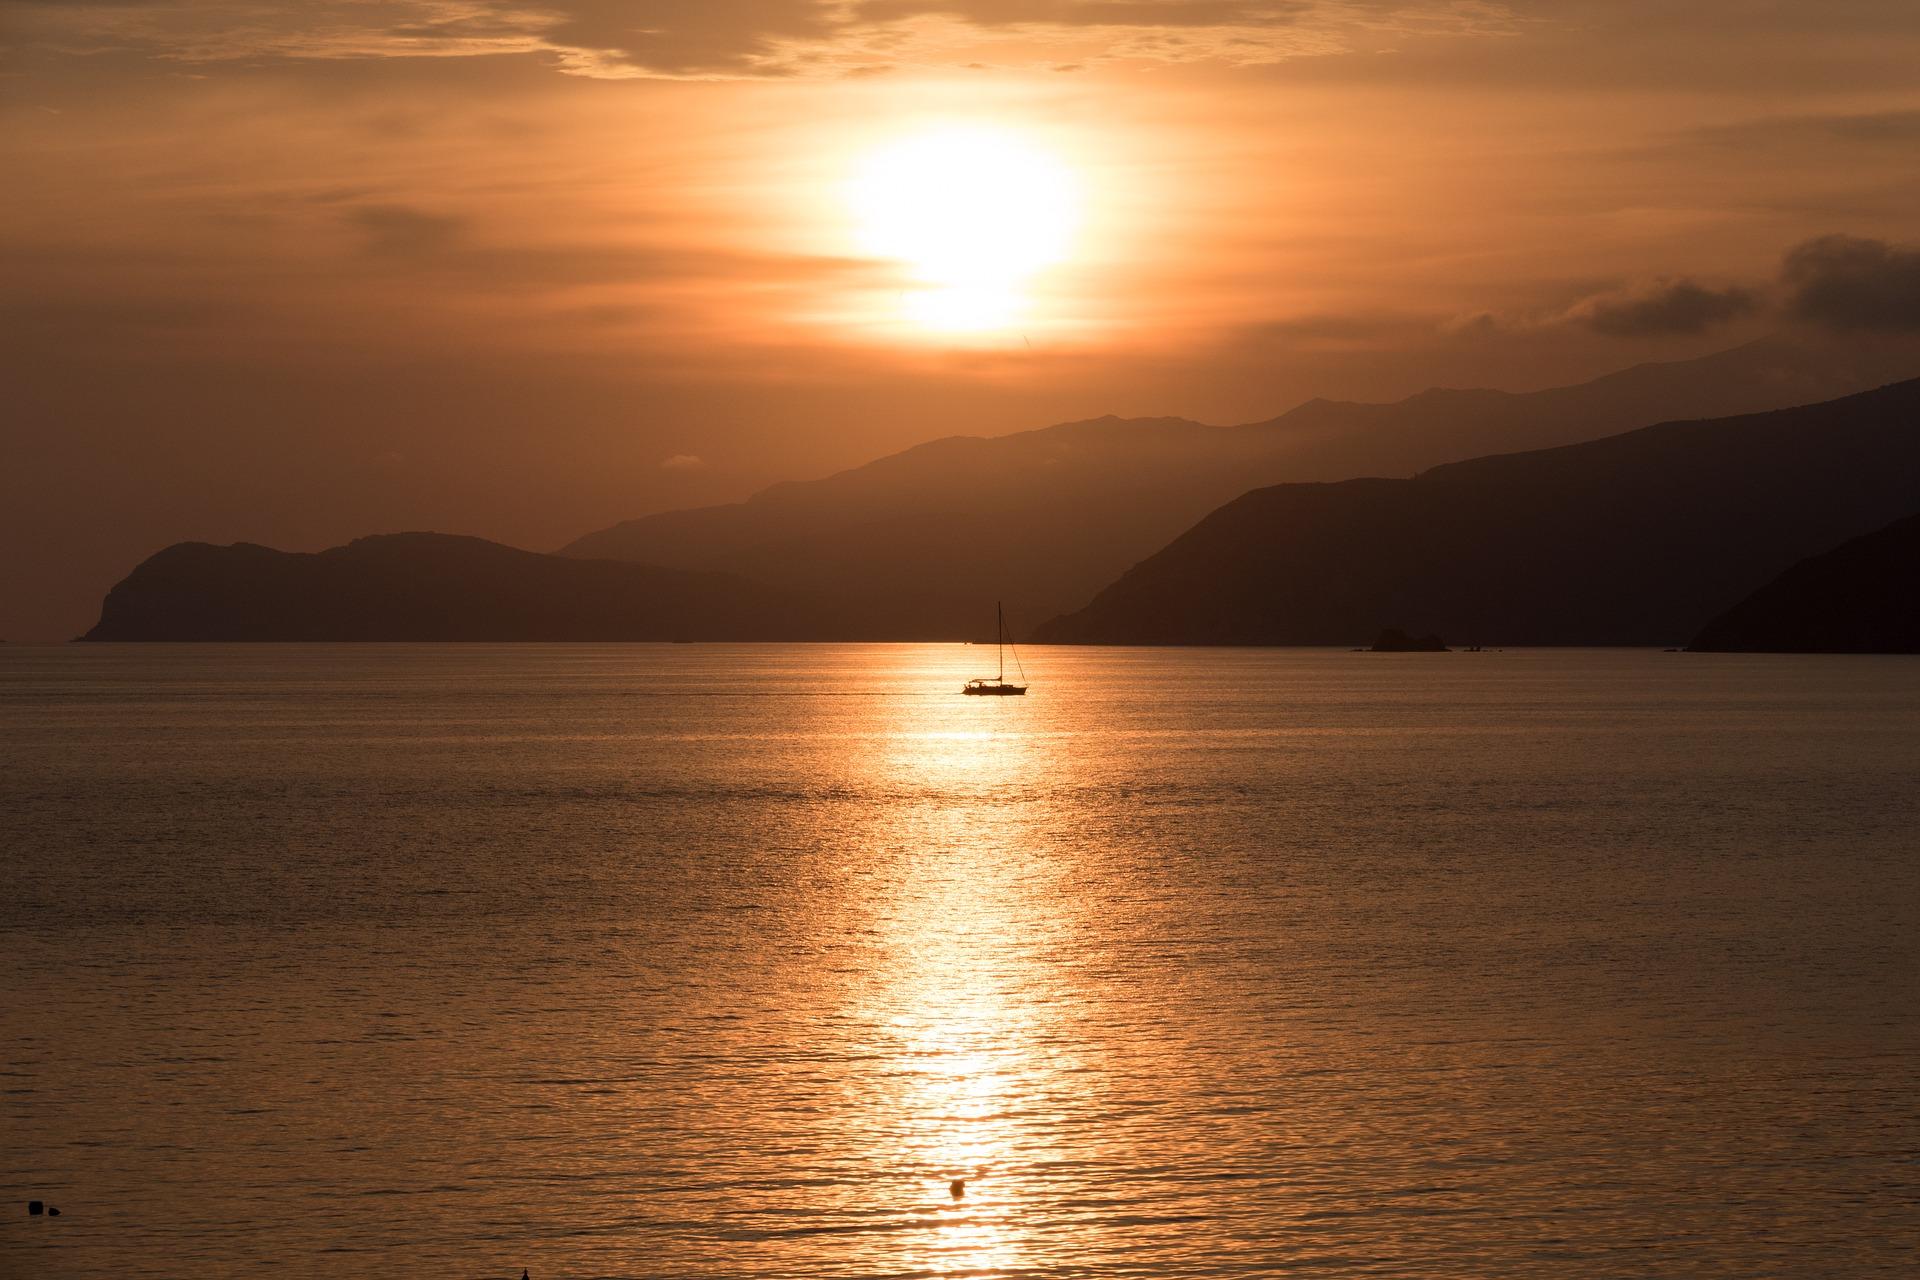 http://normanno.com/N0rm4nn0/wp-content/uploads/2018/07/sunset-isola-elba-italia.jpg